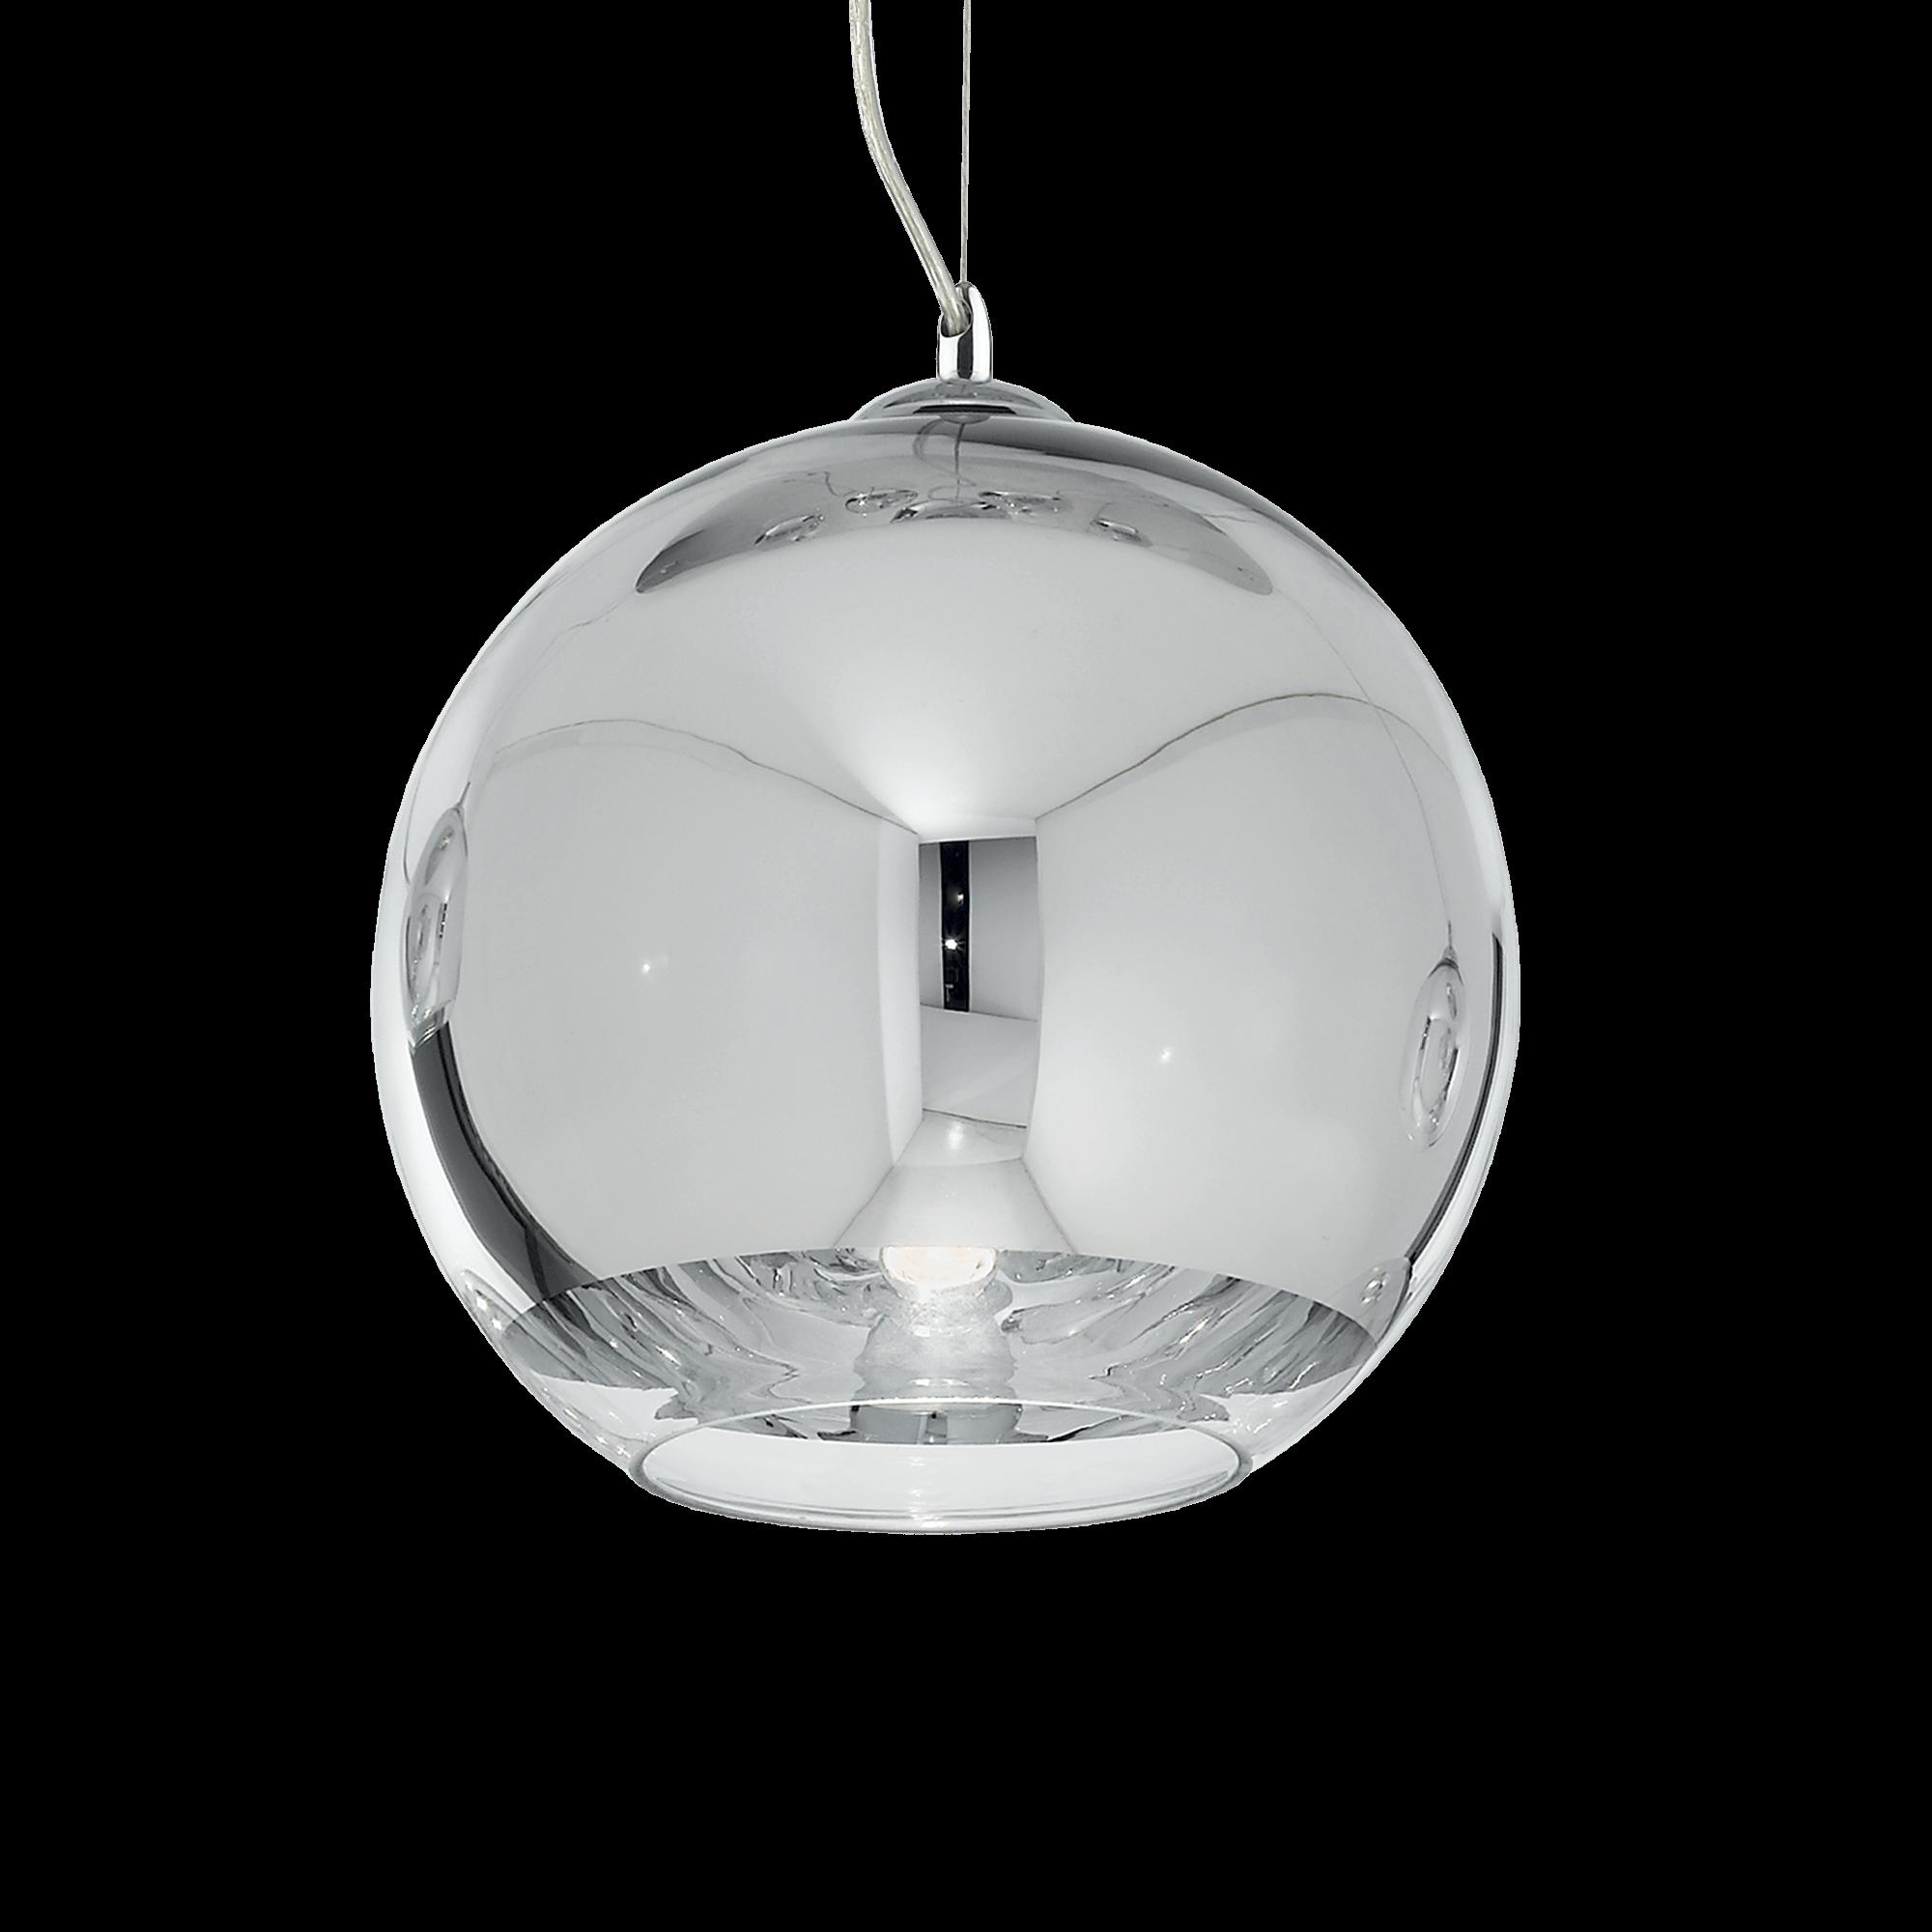 Ideal Lux 059648 Discovery cromo SP1 D30 lámpa függeszték